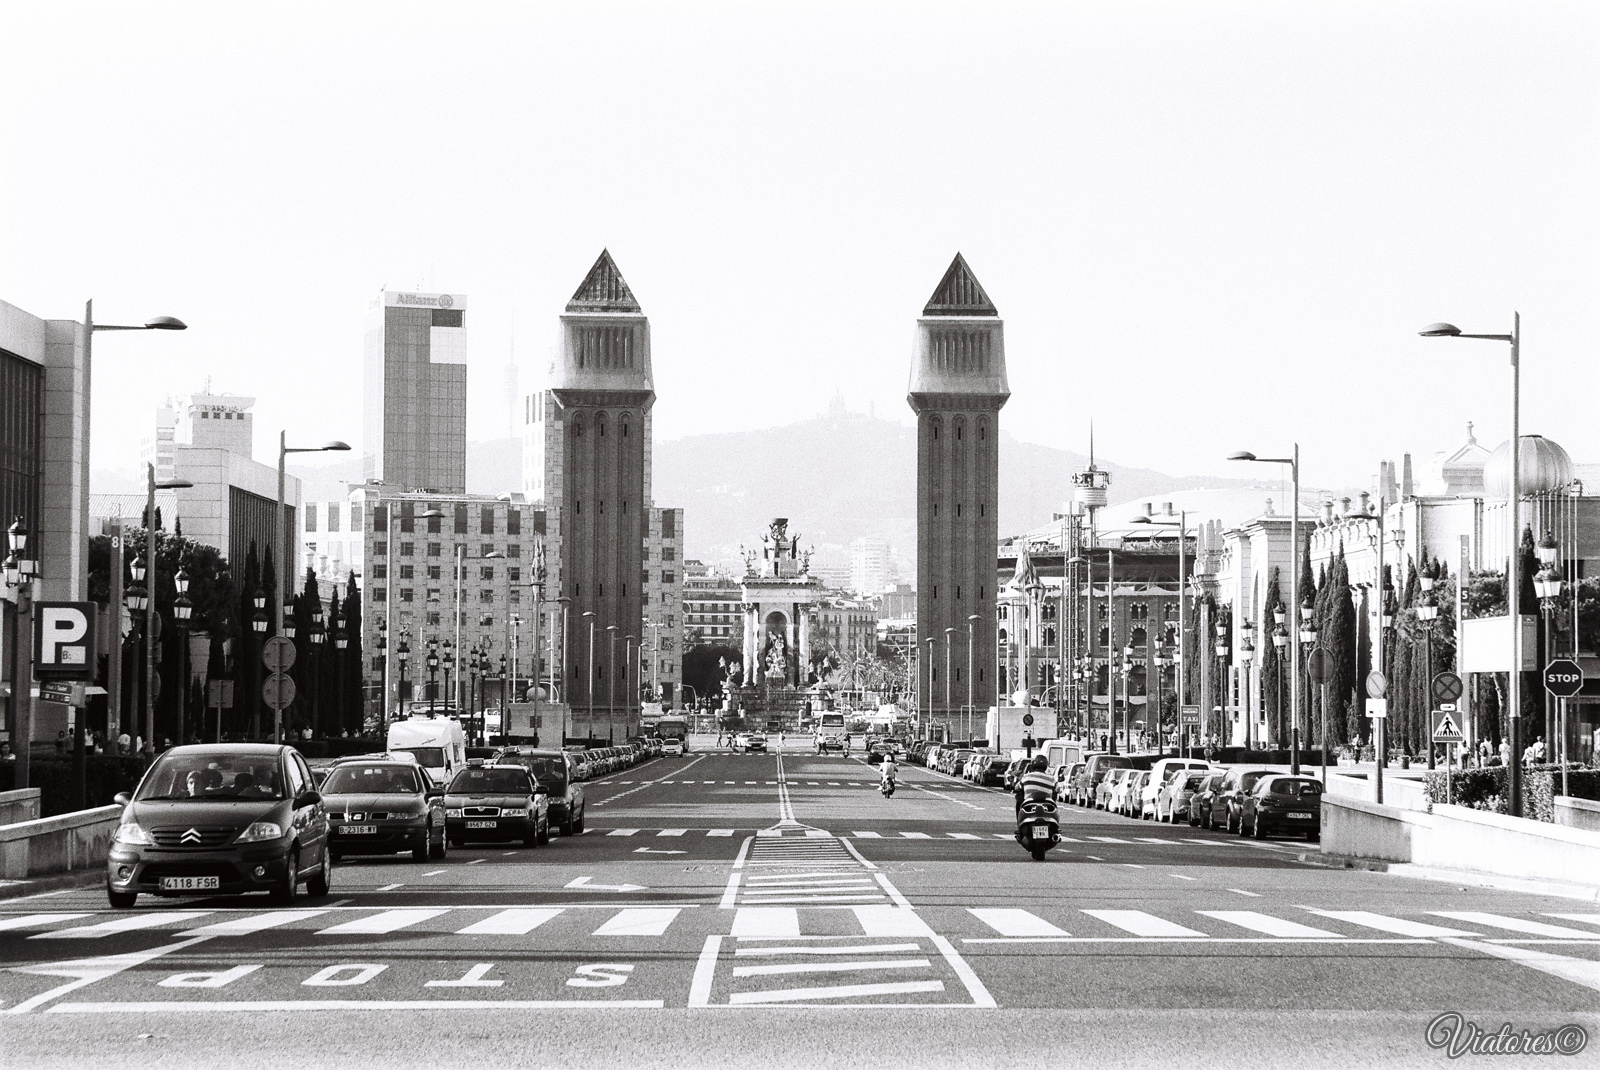 Plaça d'Espanya. Barcelona. Spain